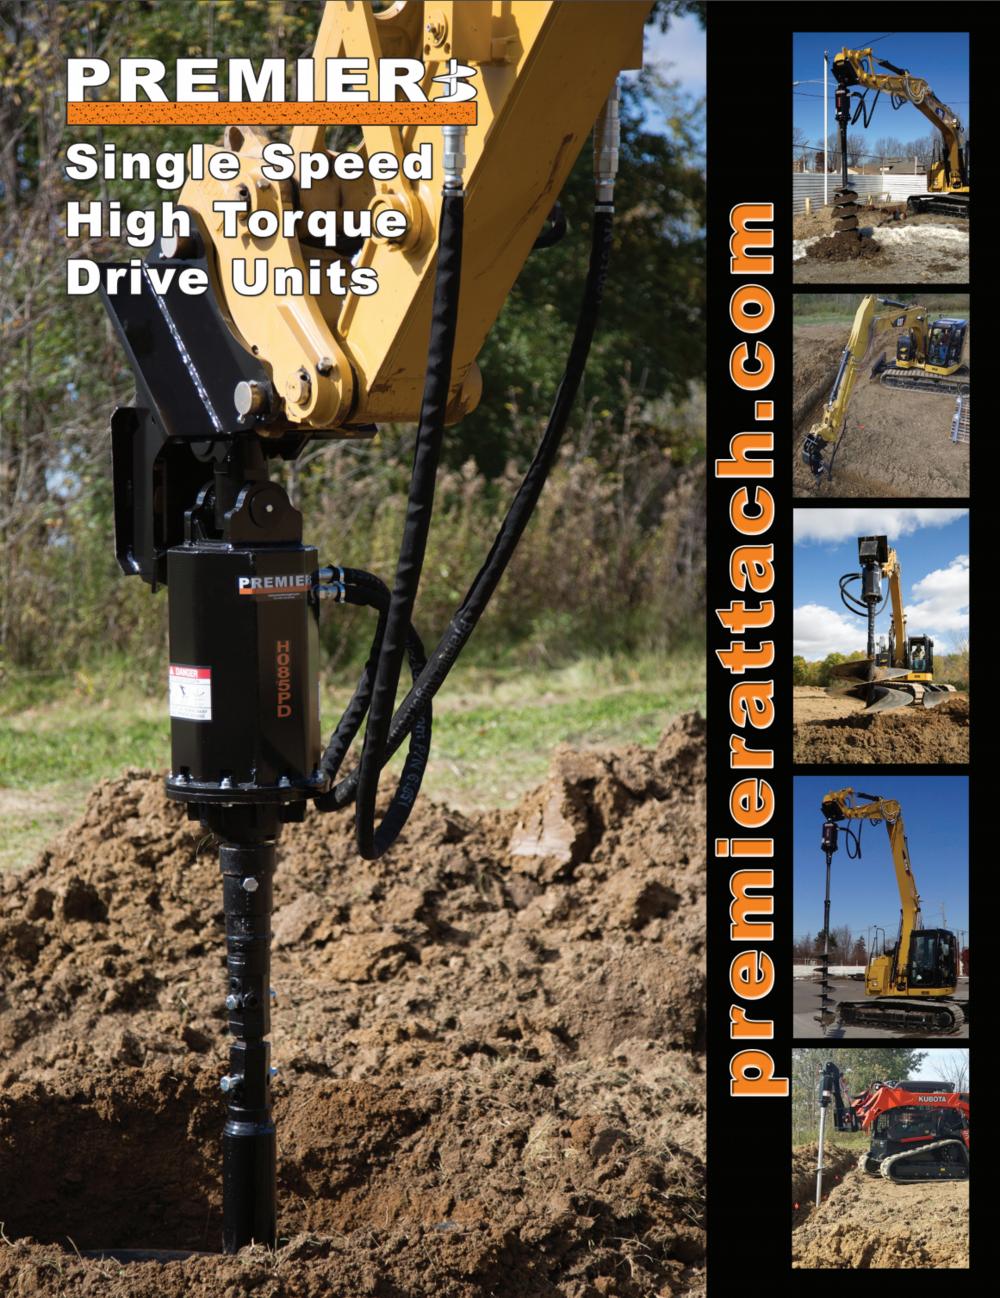 Single Speed High Torque Auger Brochure